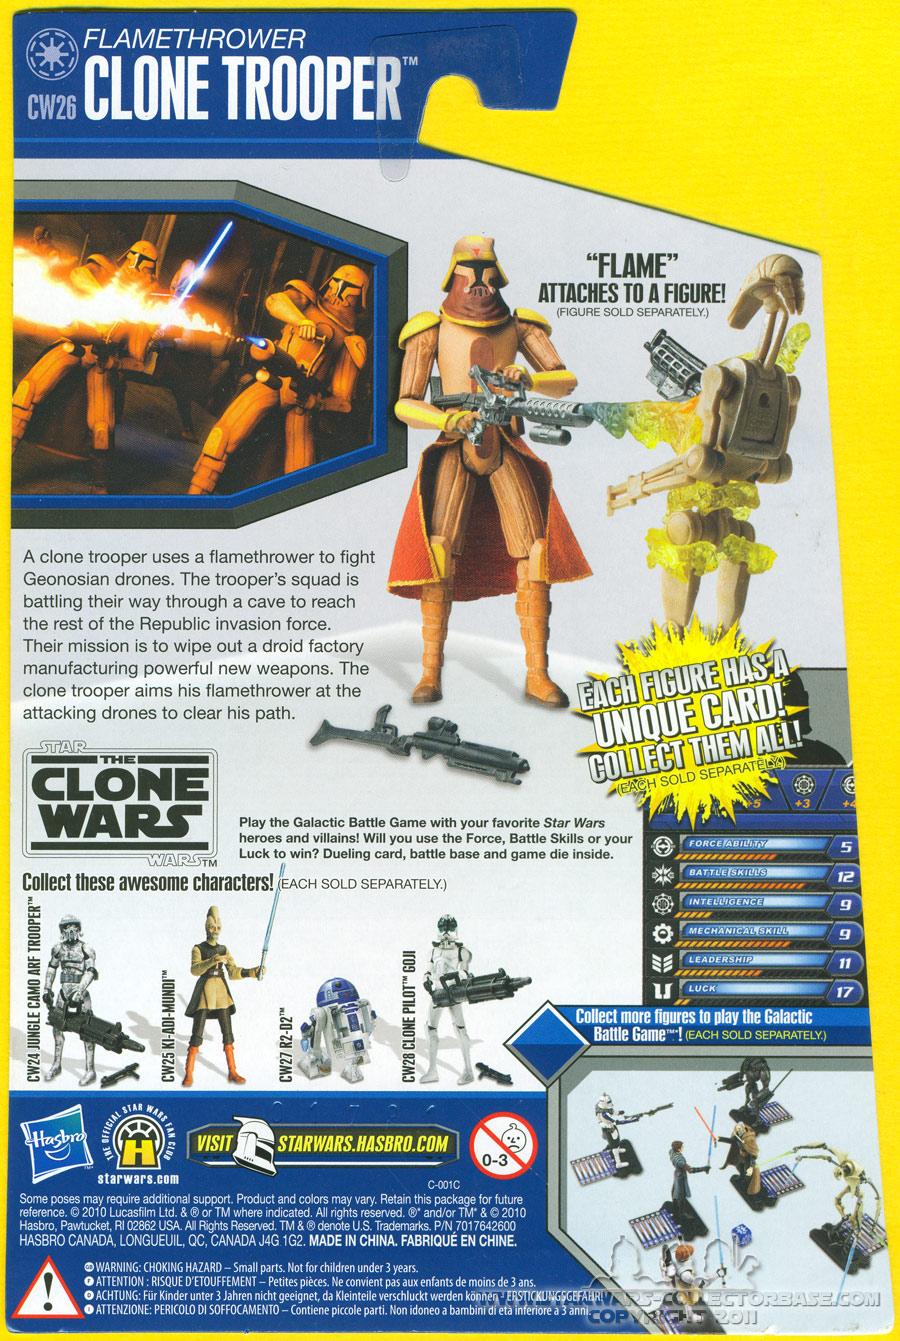 Flamethrower Clone Trooper CW26 TCW